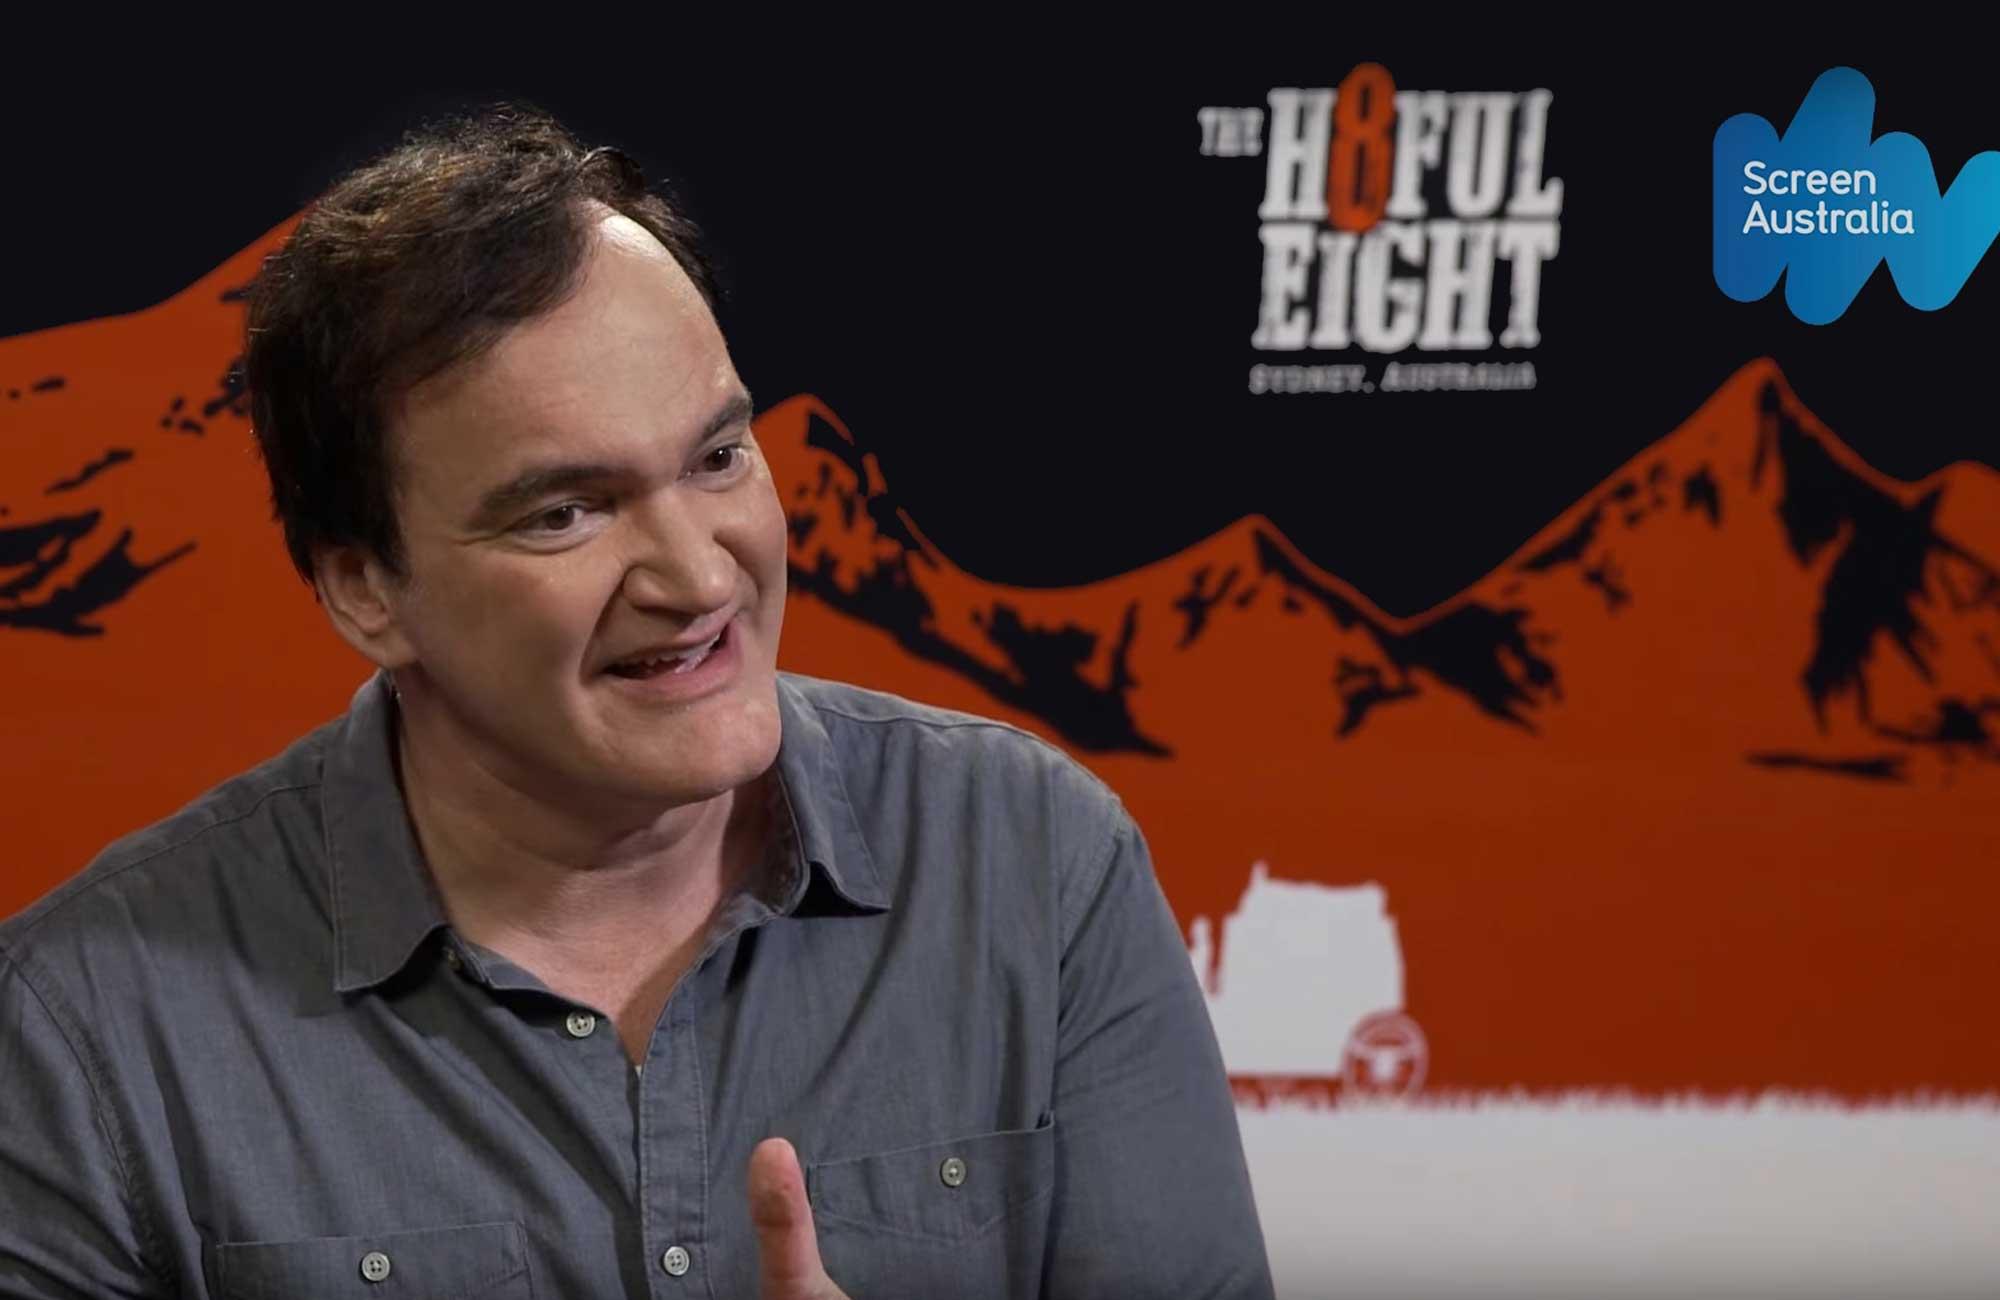 Tarantino's Top Australian Films